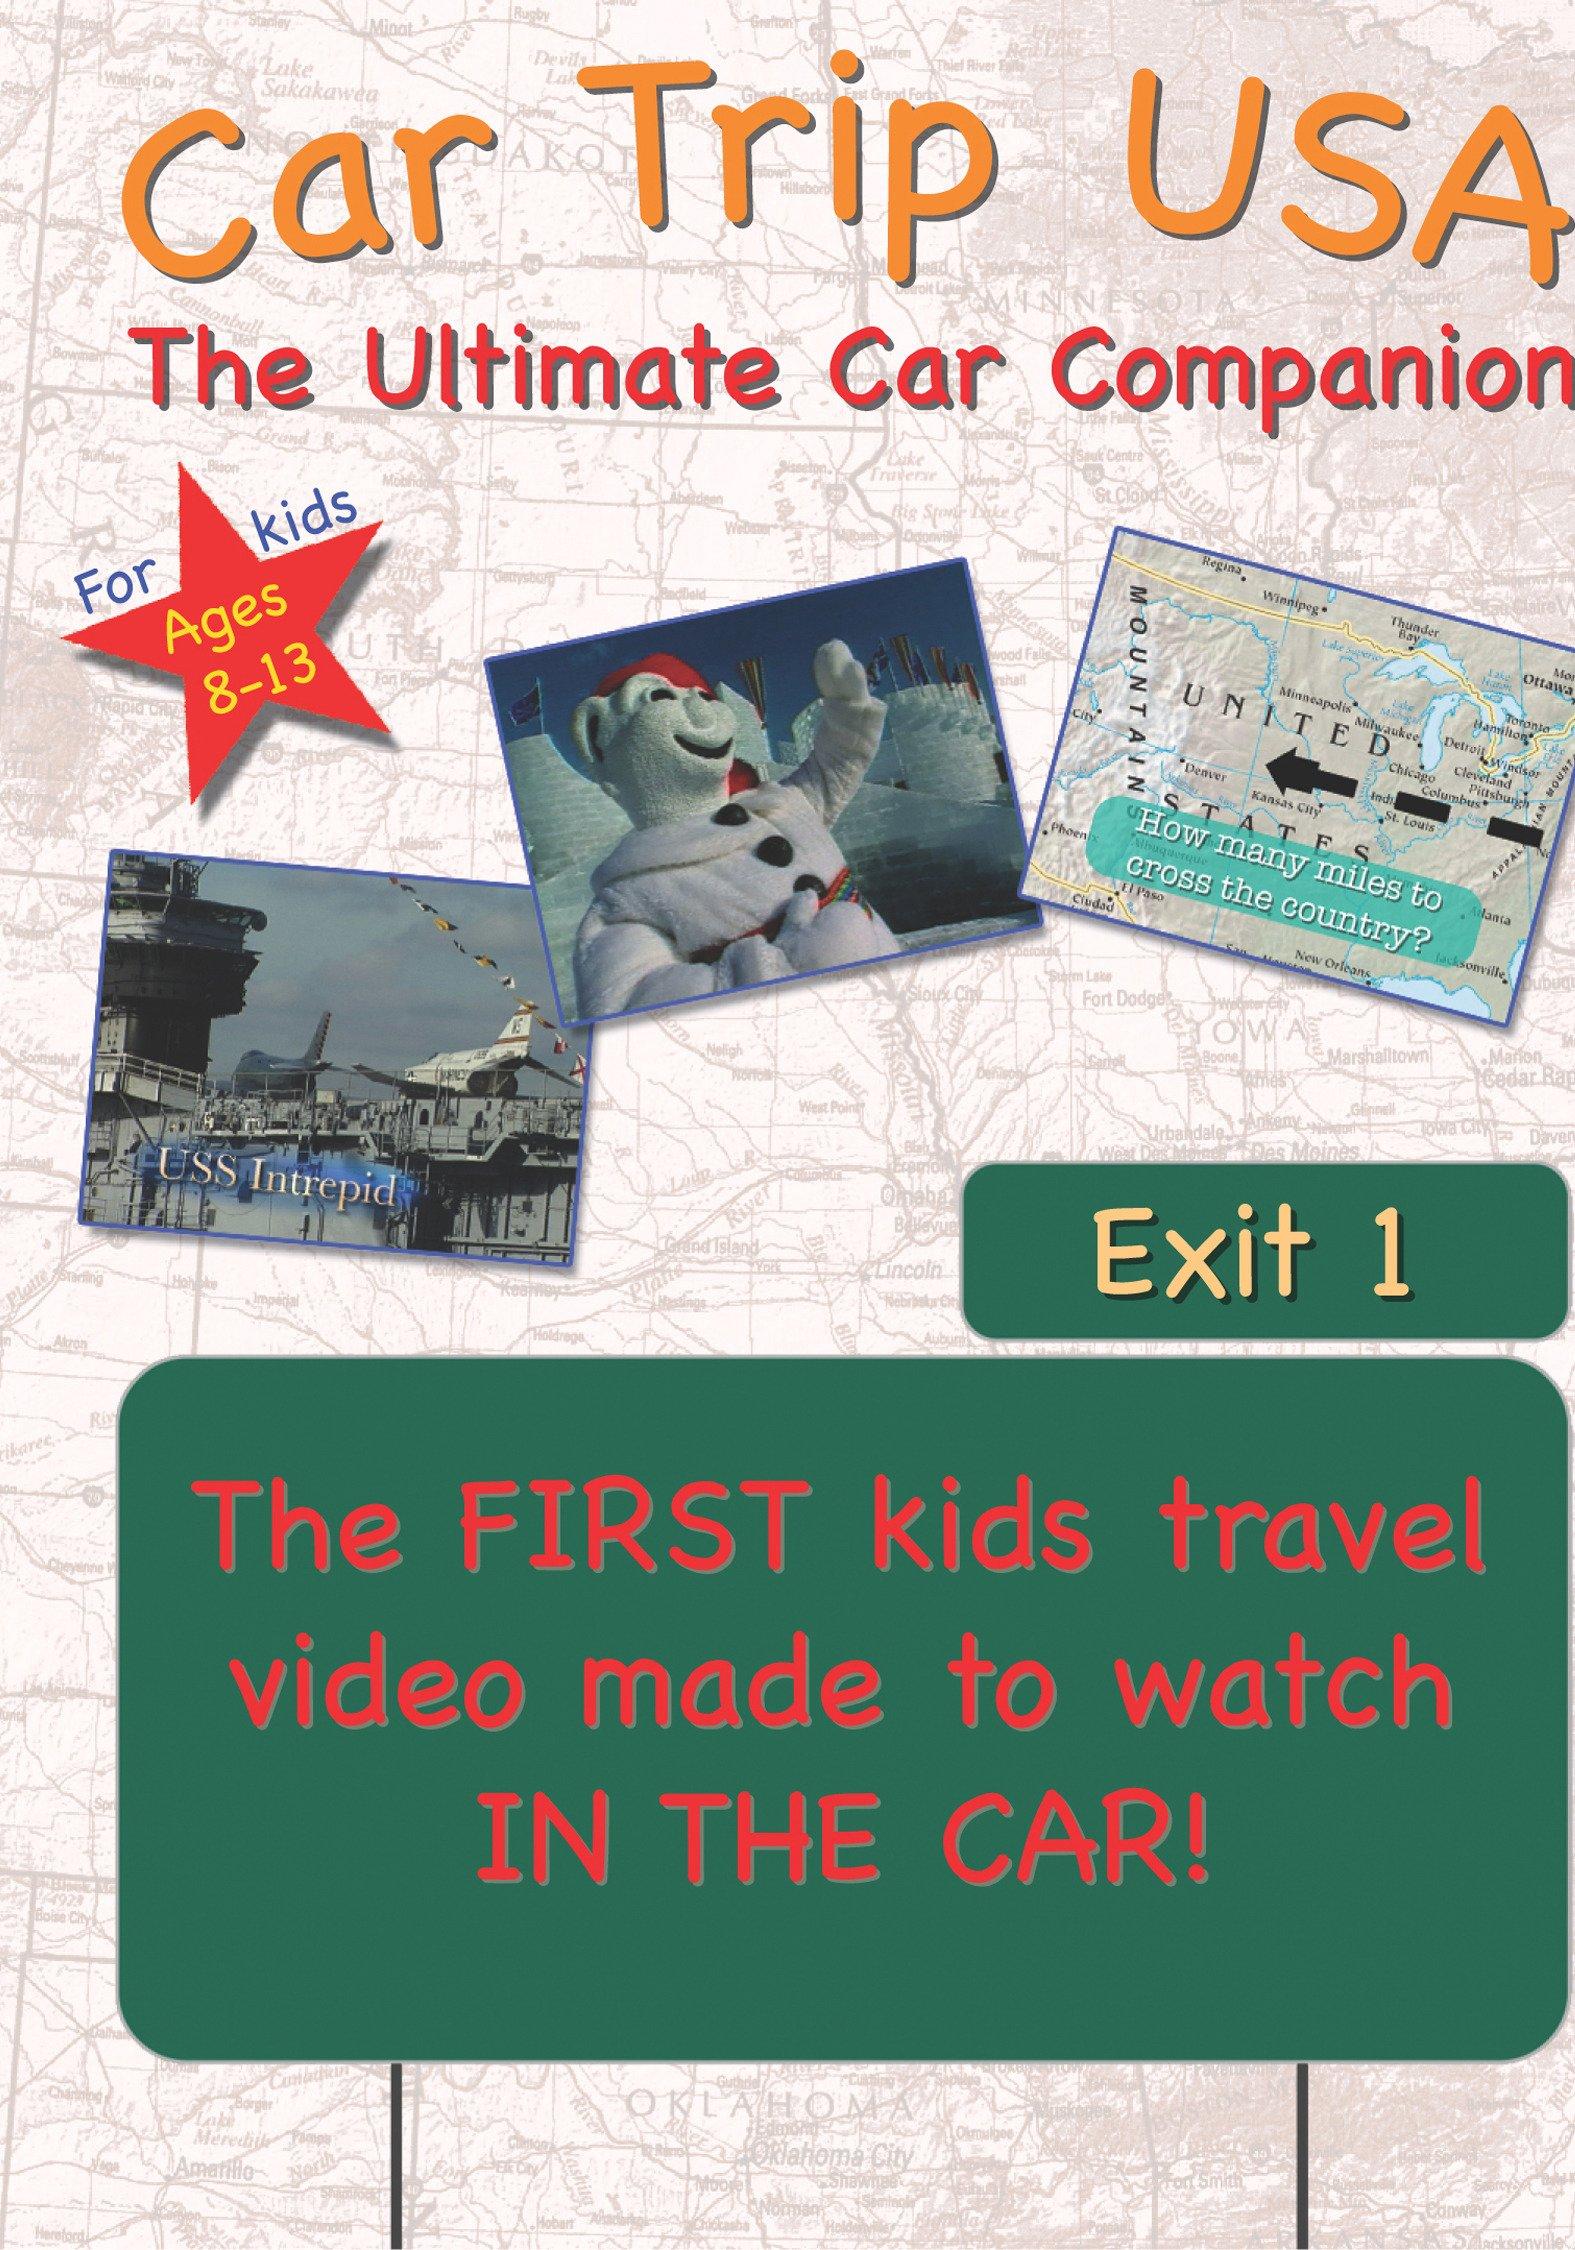 Car Trip USA - The Ultimate Car Companion